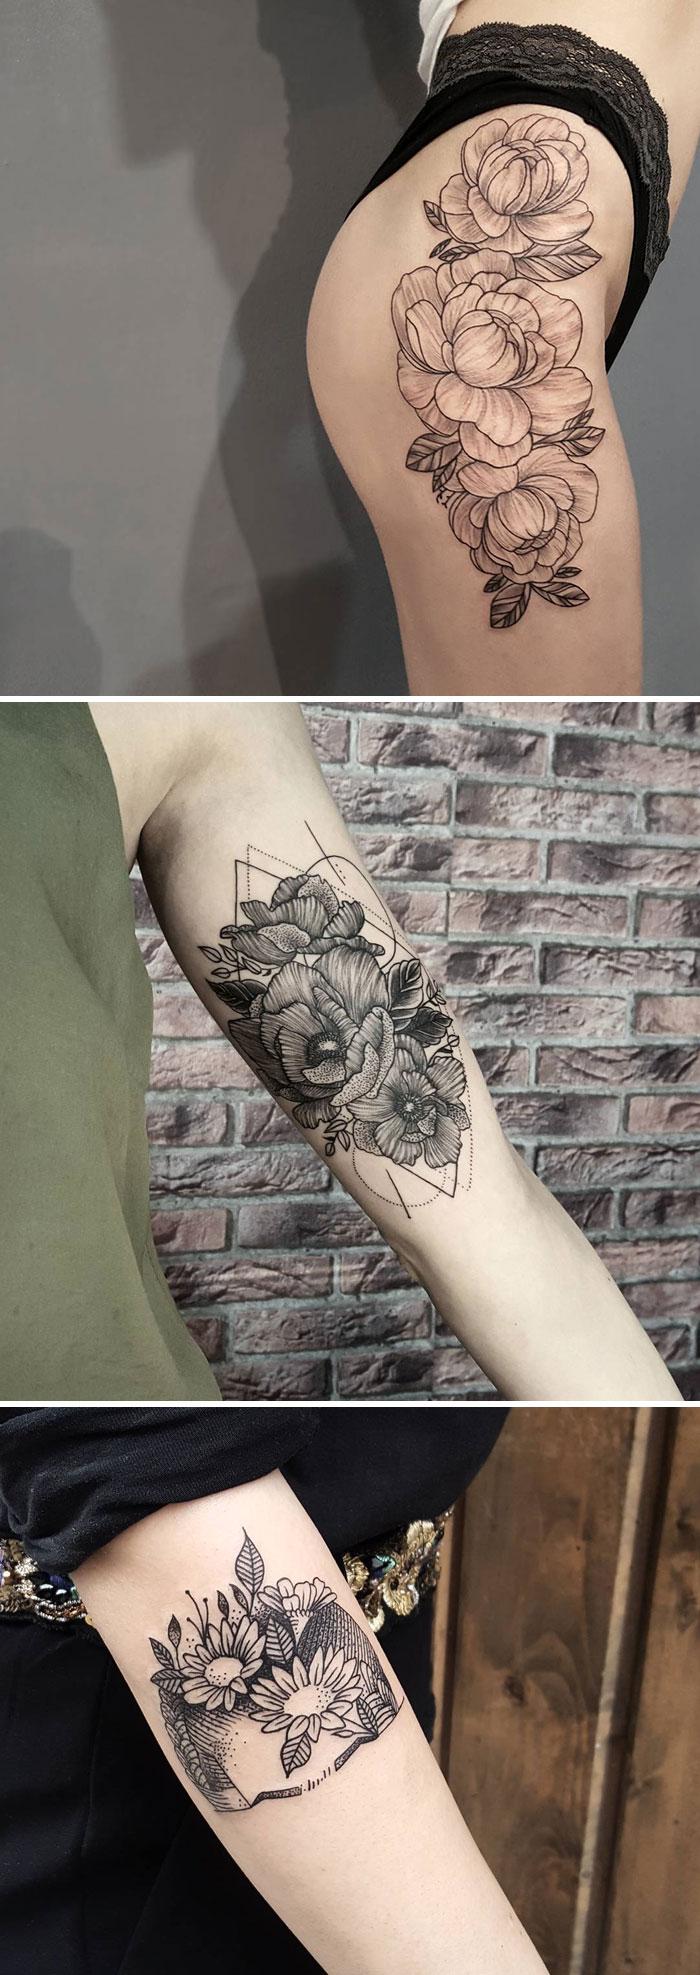 tatuagens-florais (18)